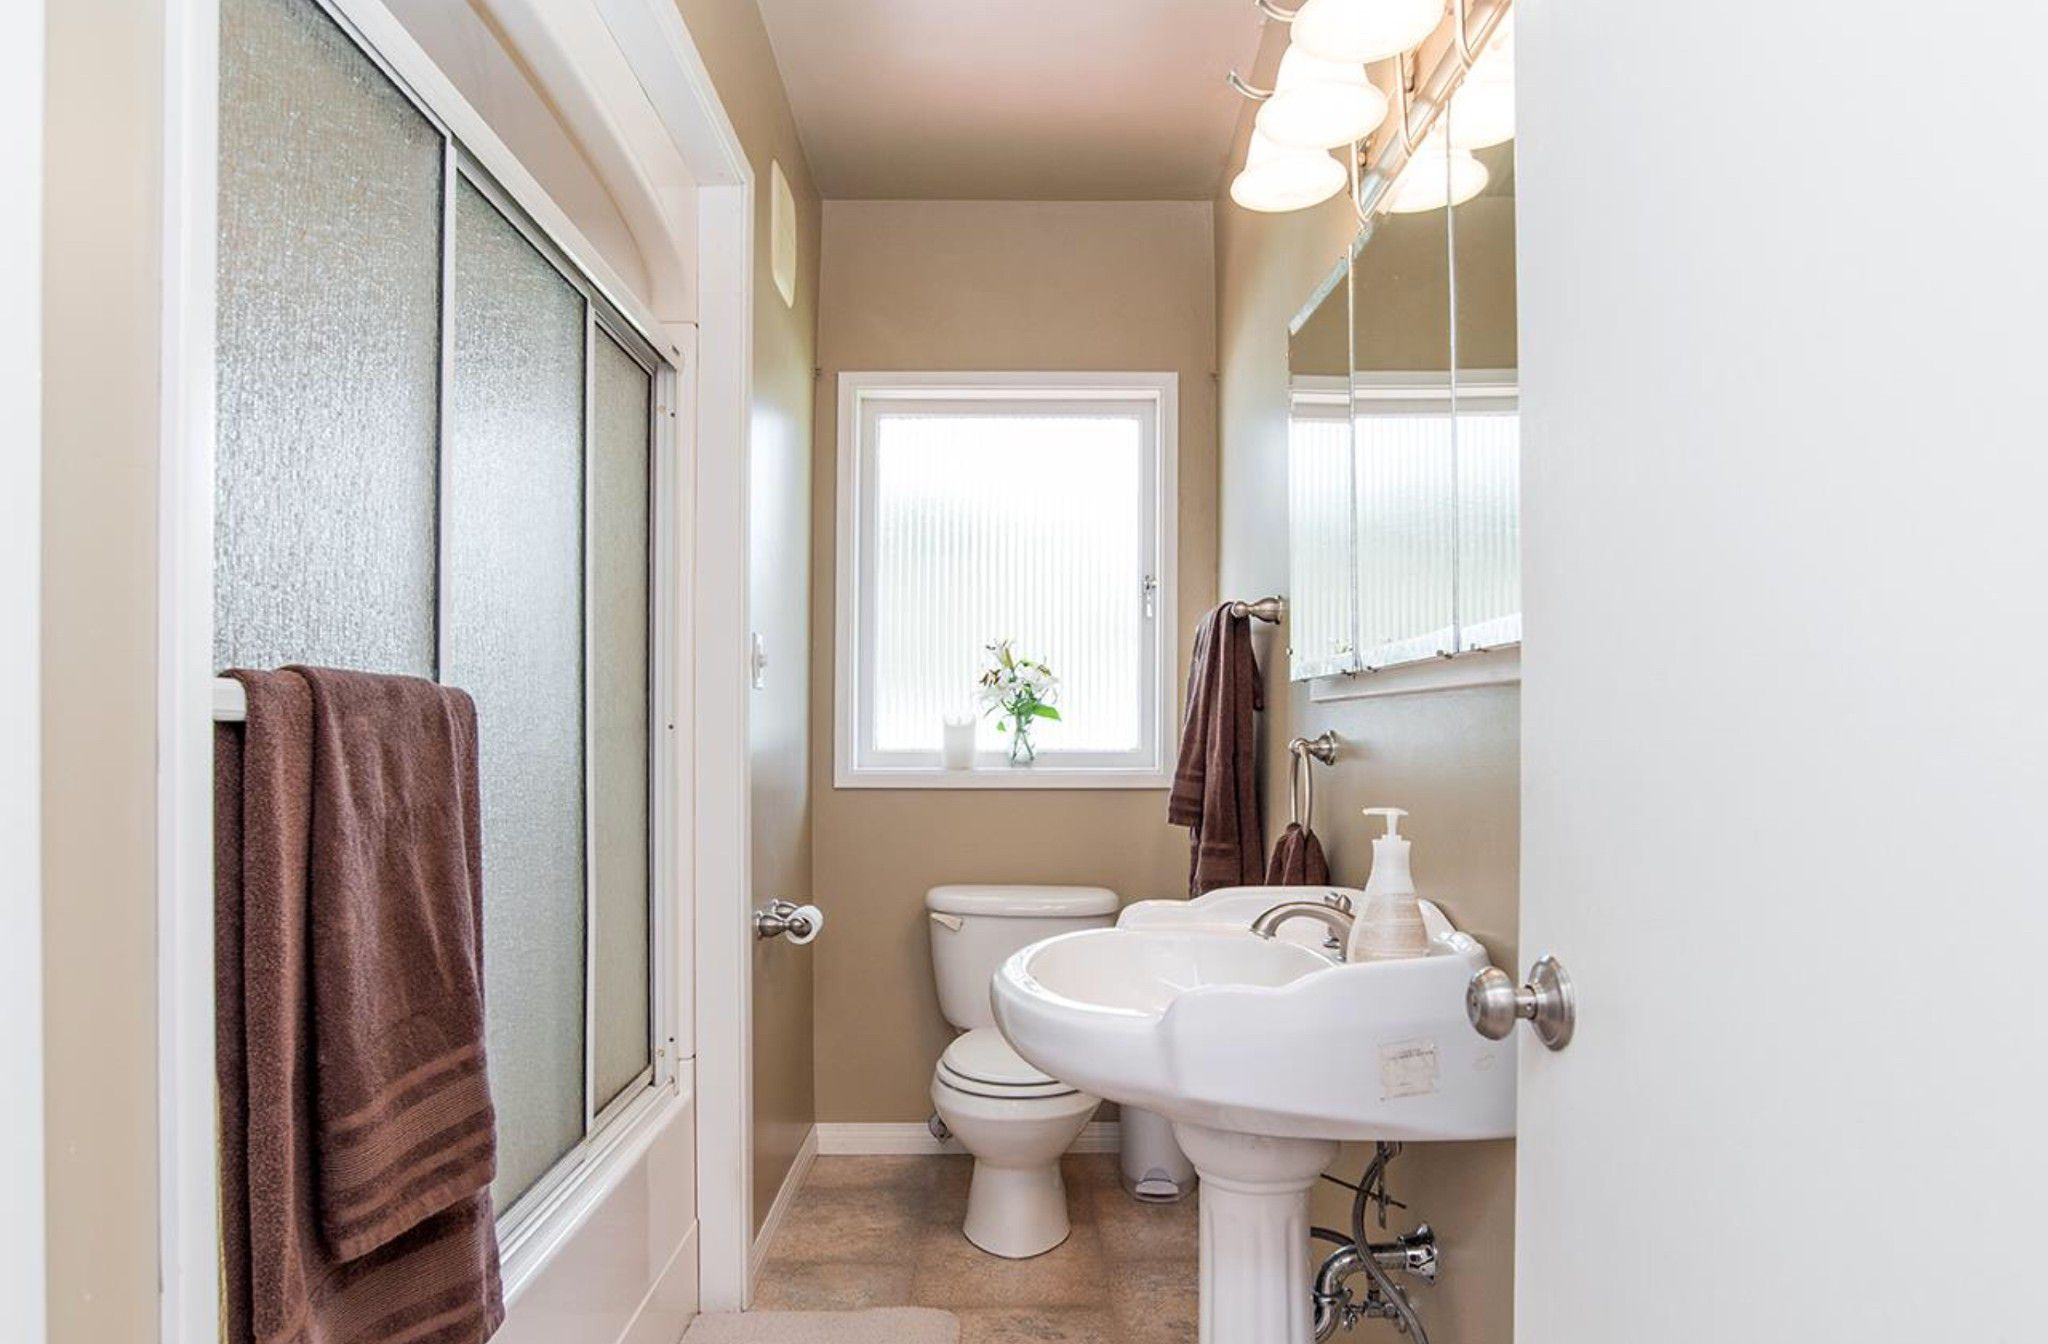 Photo 11: Photos: 10327 127A Street in Surrey: Cedar Hills House for sale : MLS®# R2178137